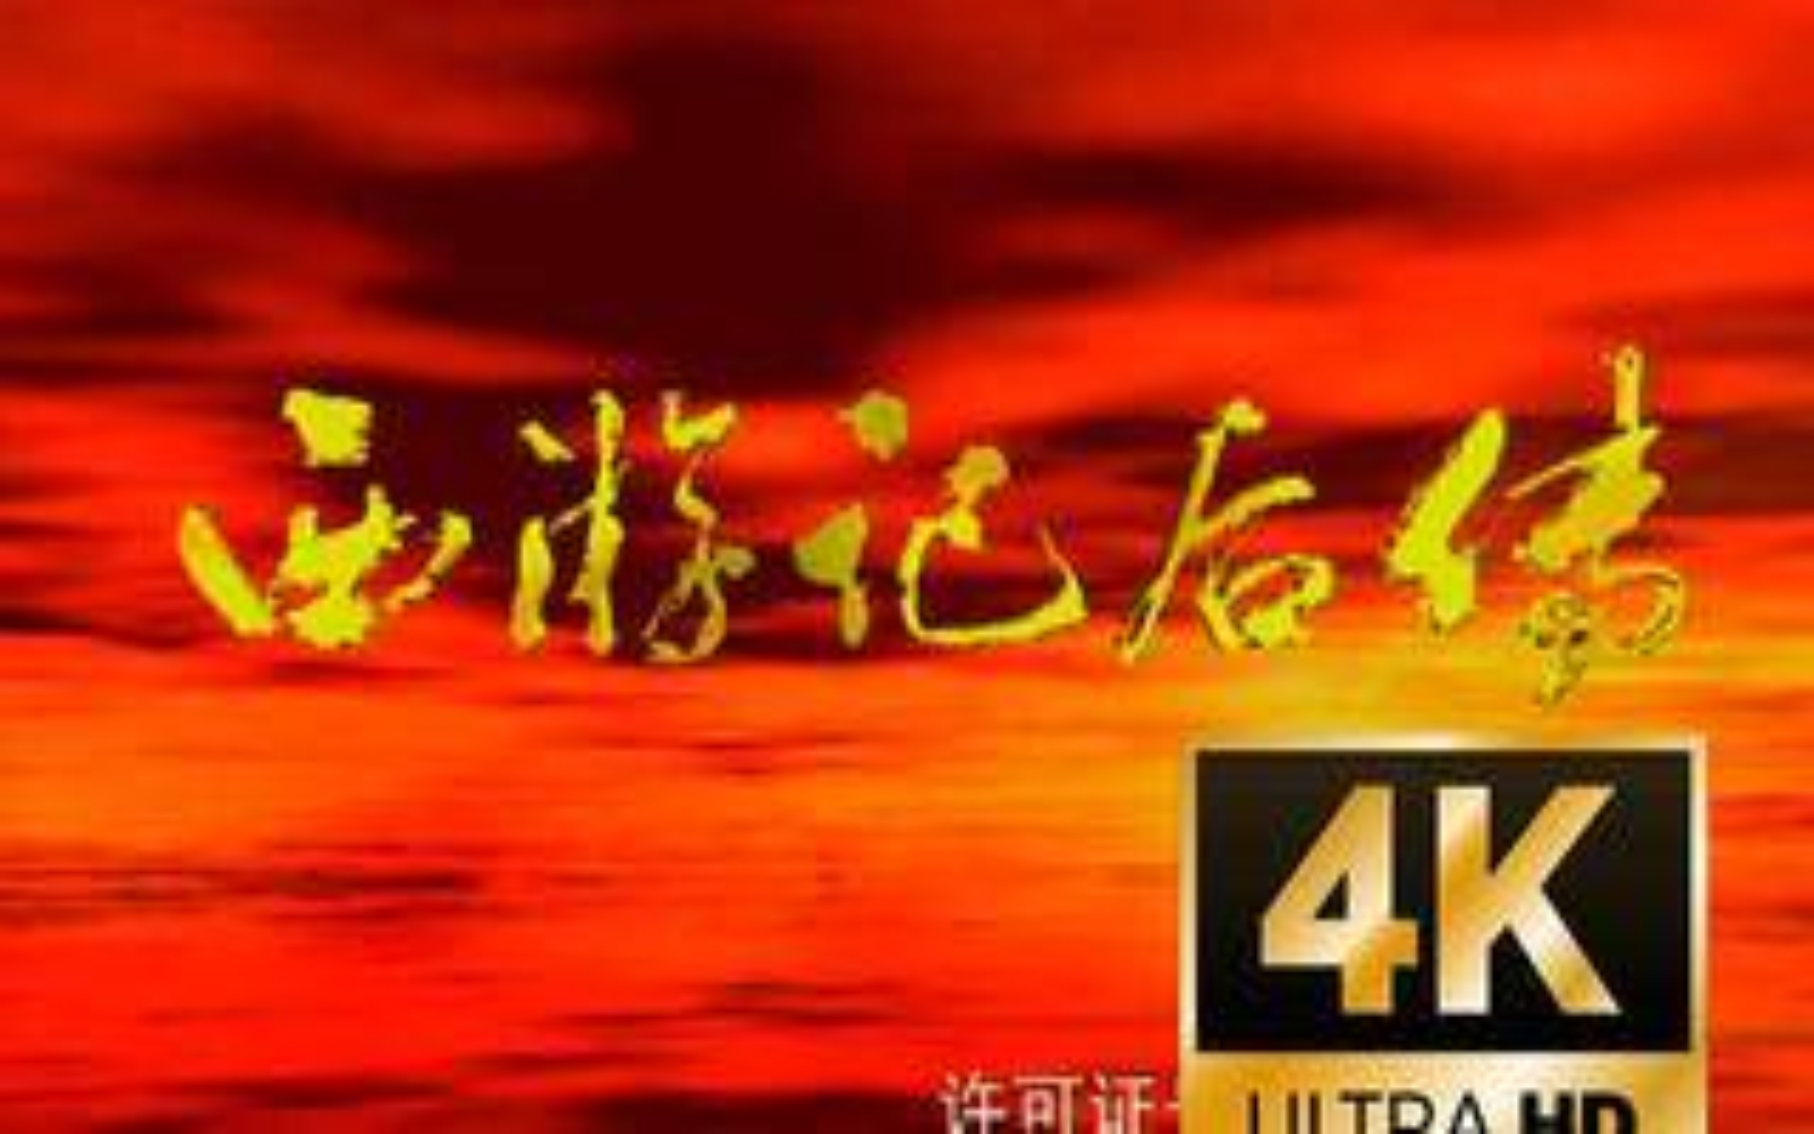 【4K修复】去鬼畜 无边框 西游记后传第五集